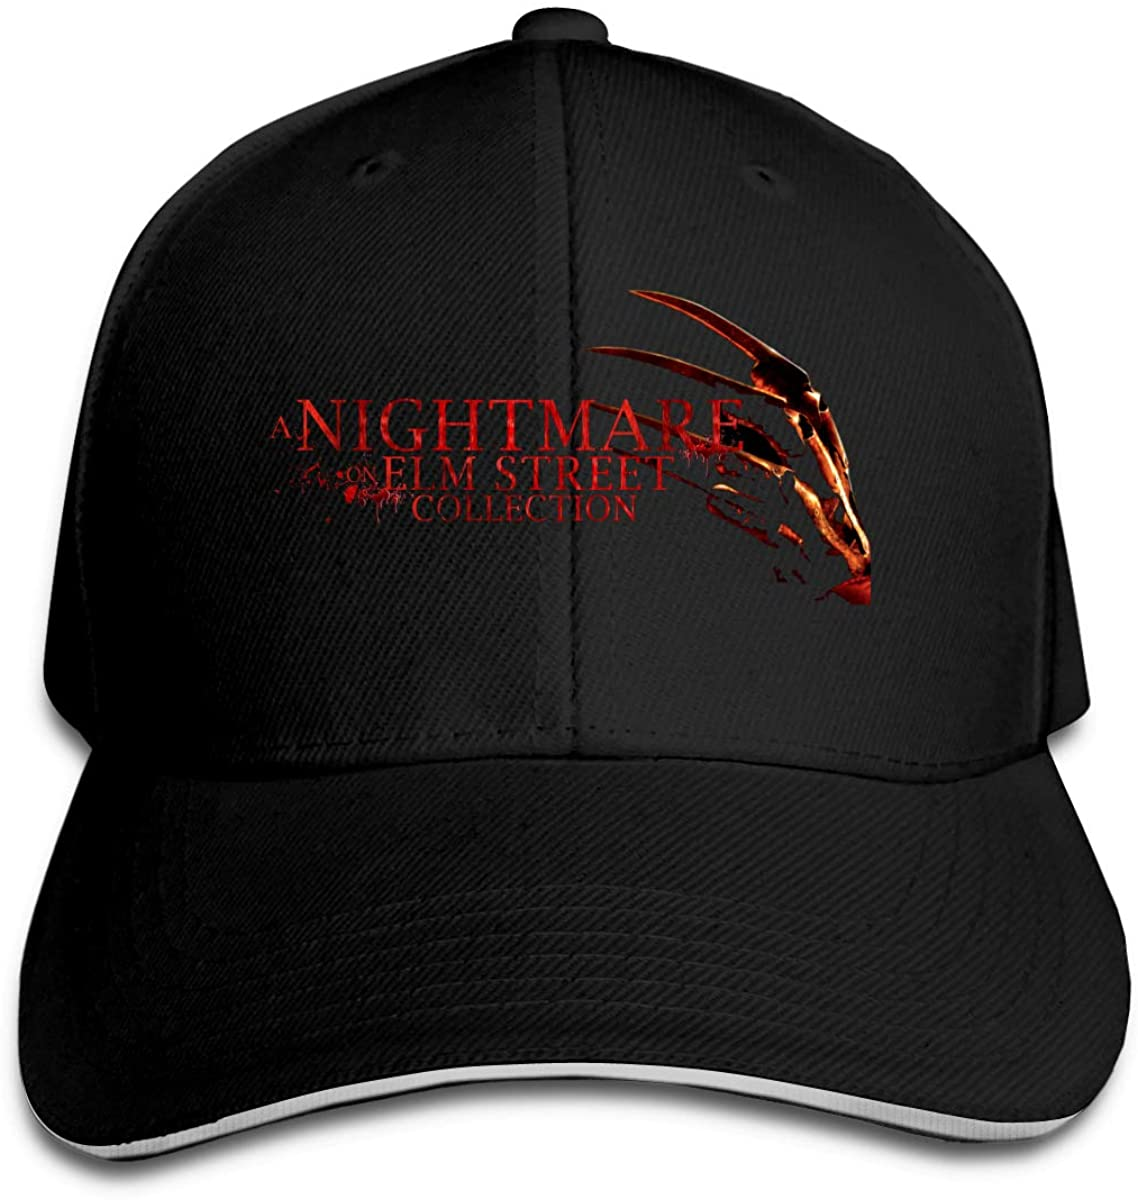 A Nightmare On Elm Street Comfort Sunbonnet